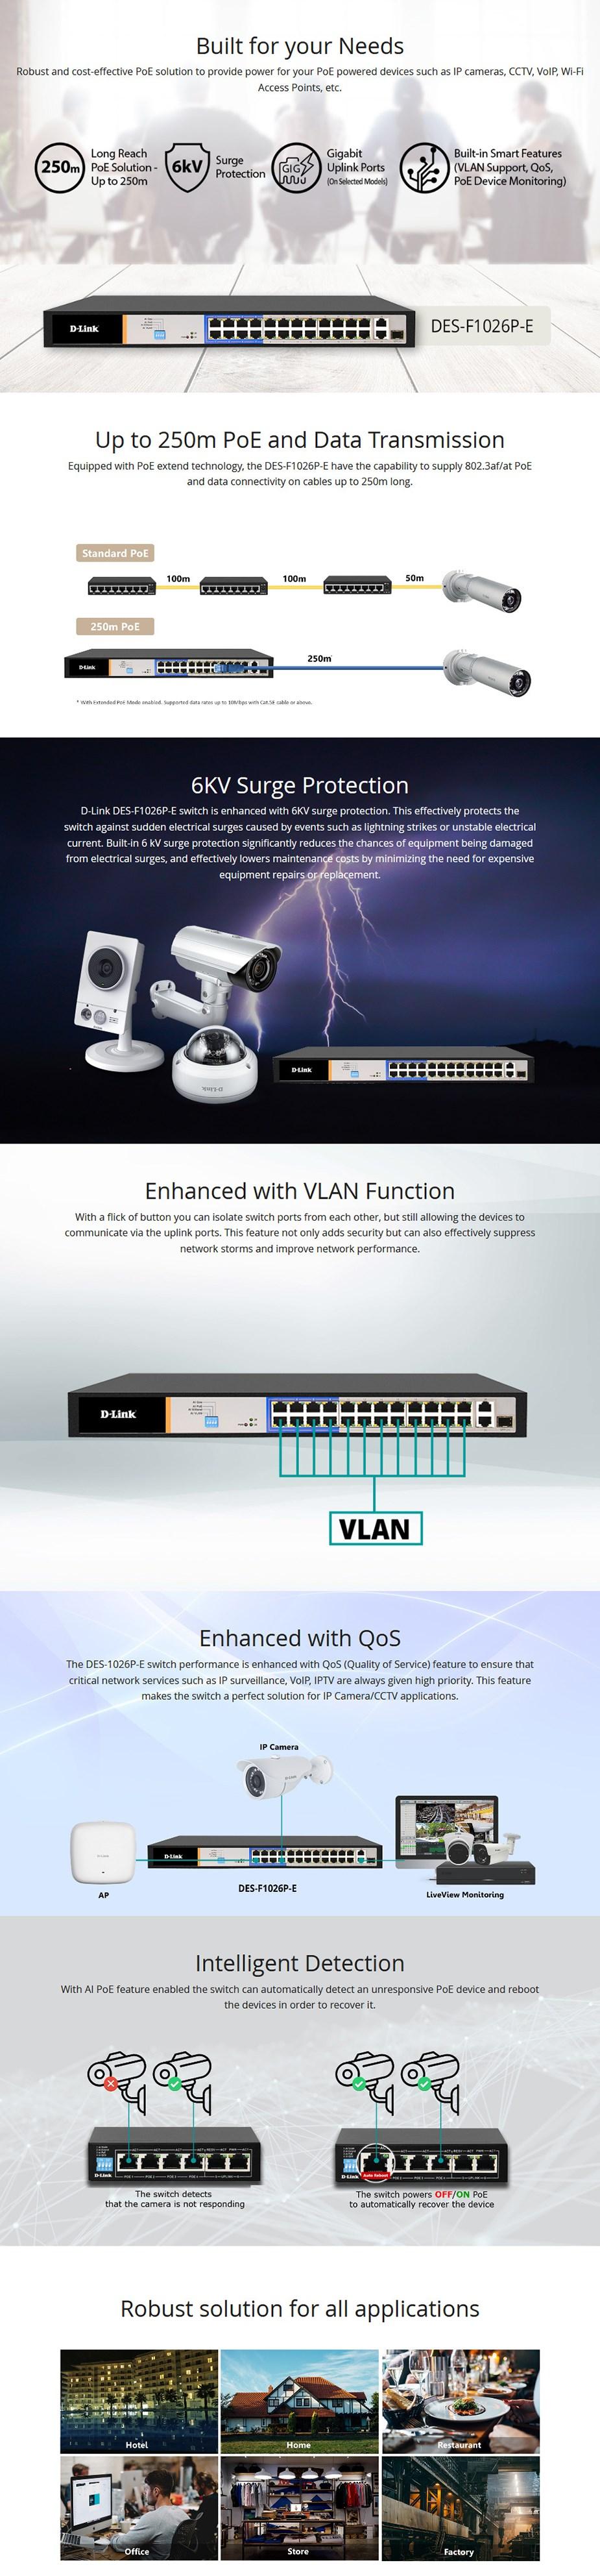 dlink-desf1026pe-26port-poe-switch-with-24-poe-ports2-gigabit-uplink-ports-ac35050-2.jpg